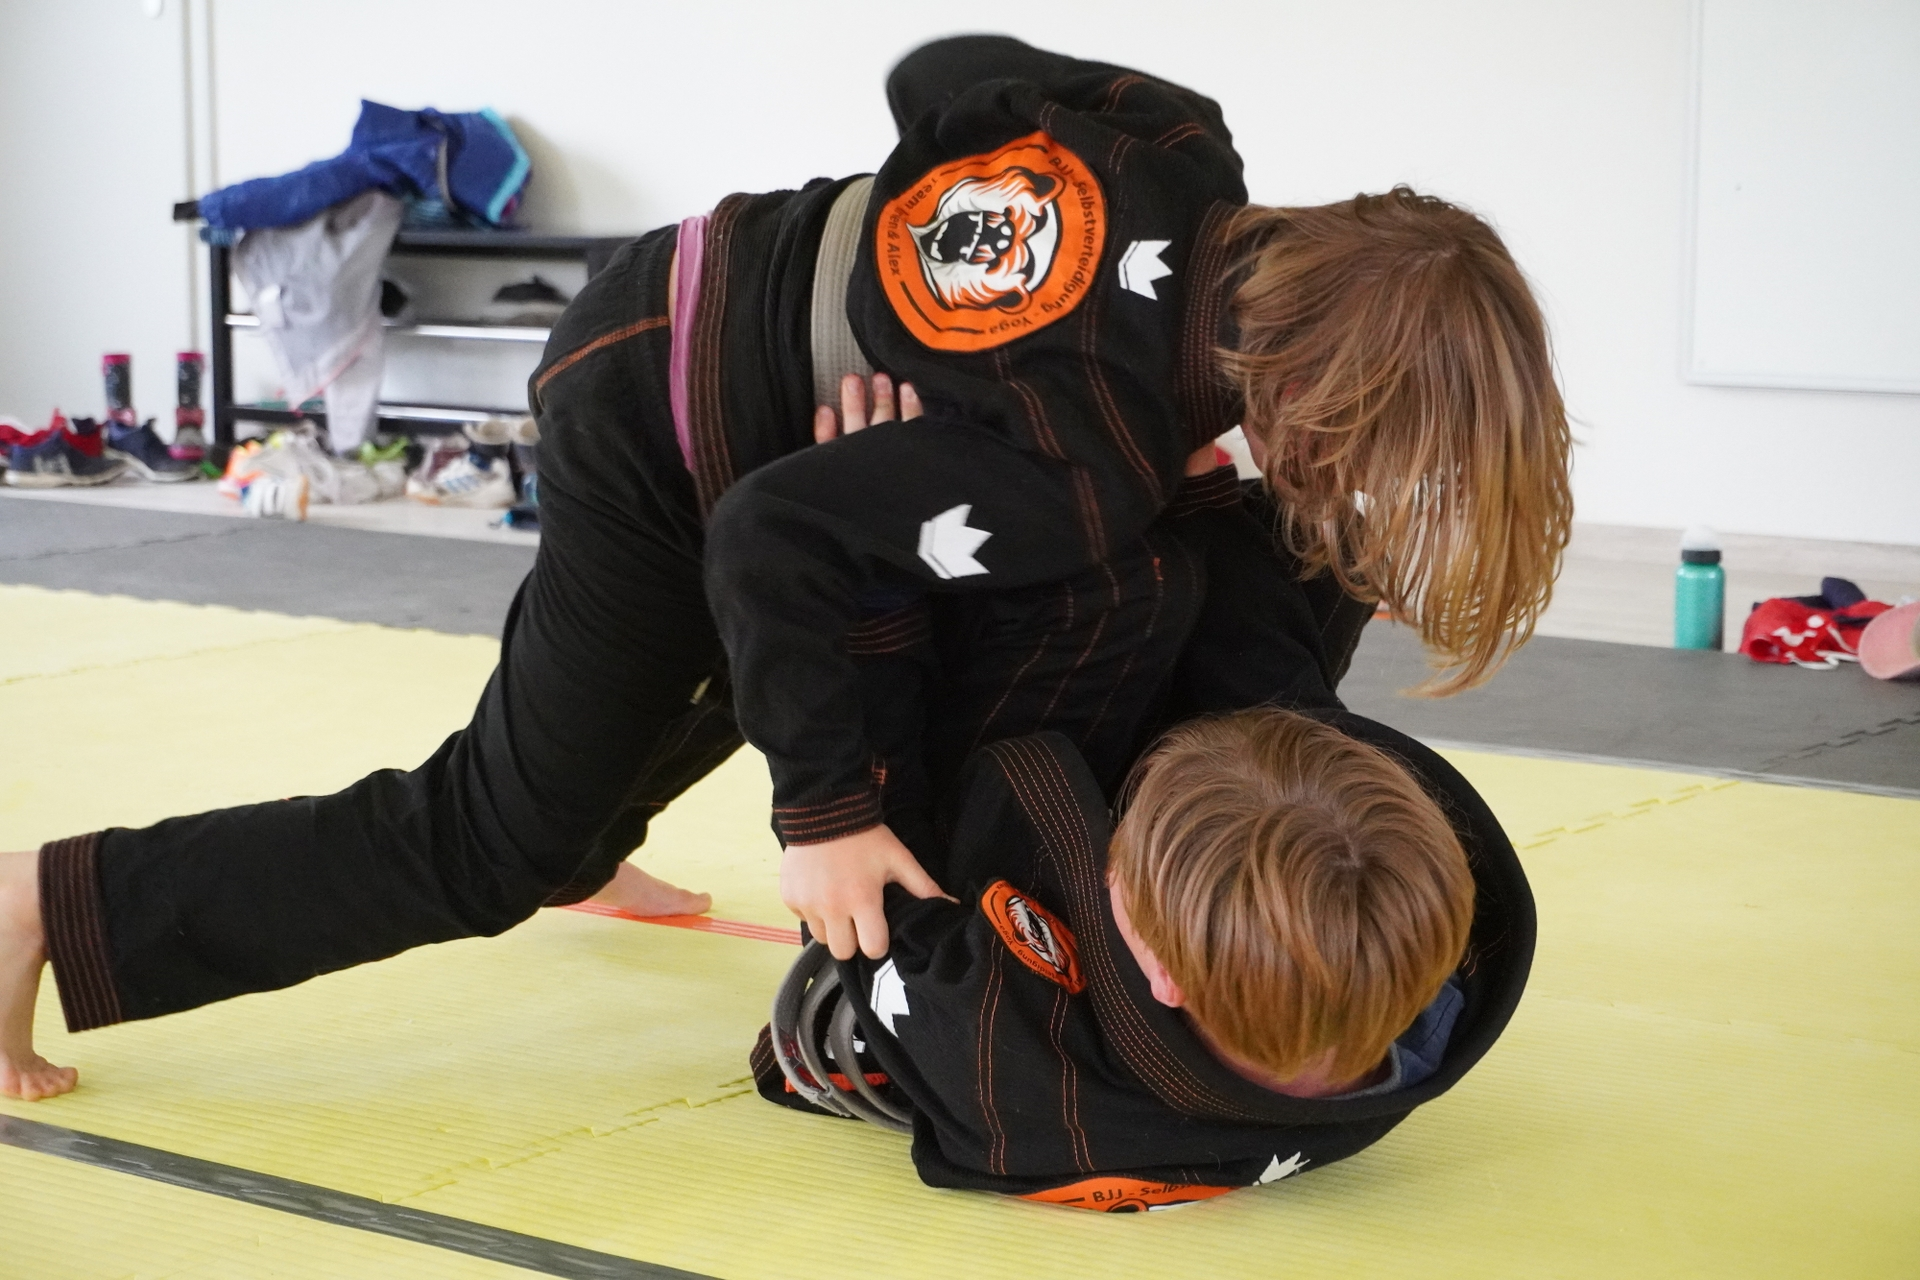 MMA - Mixed Martial Arts in München